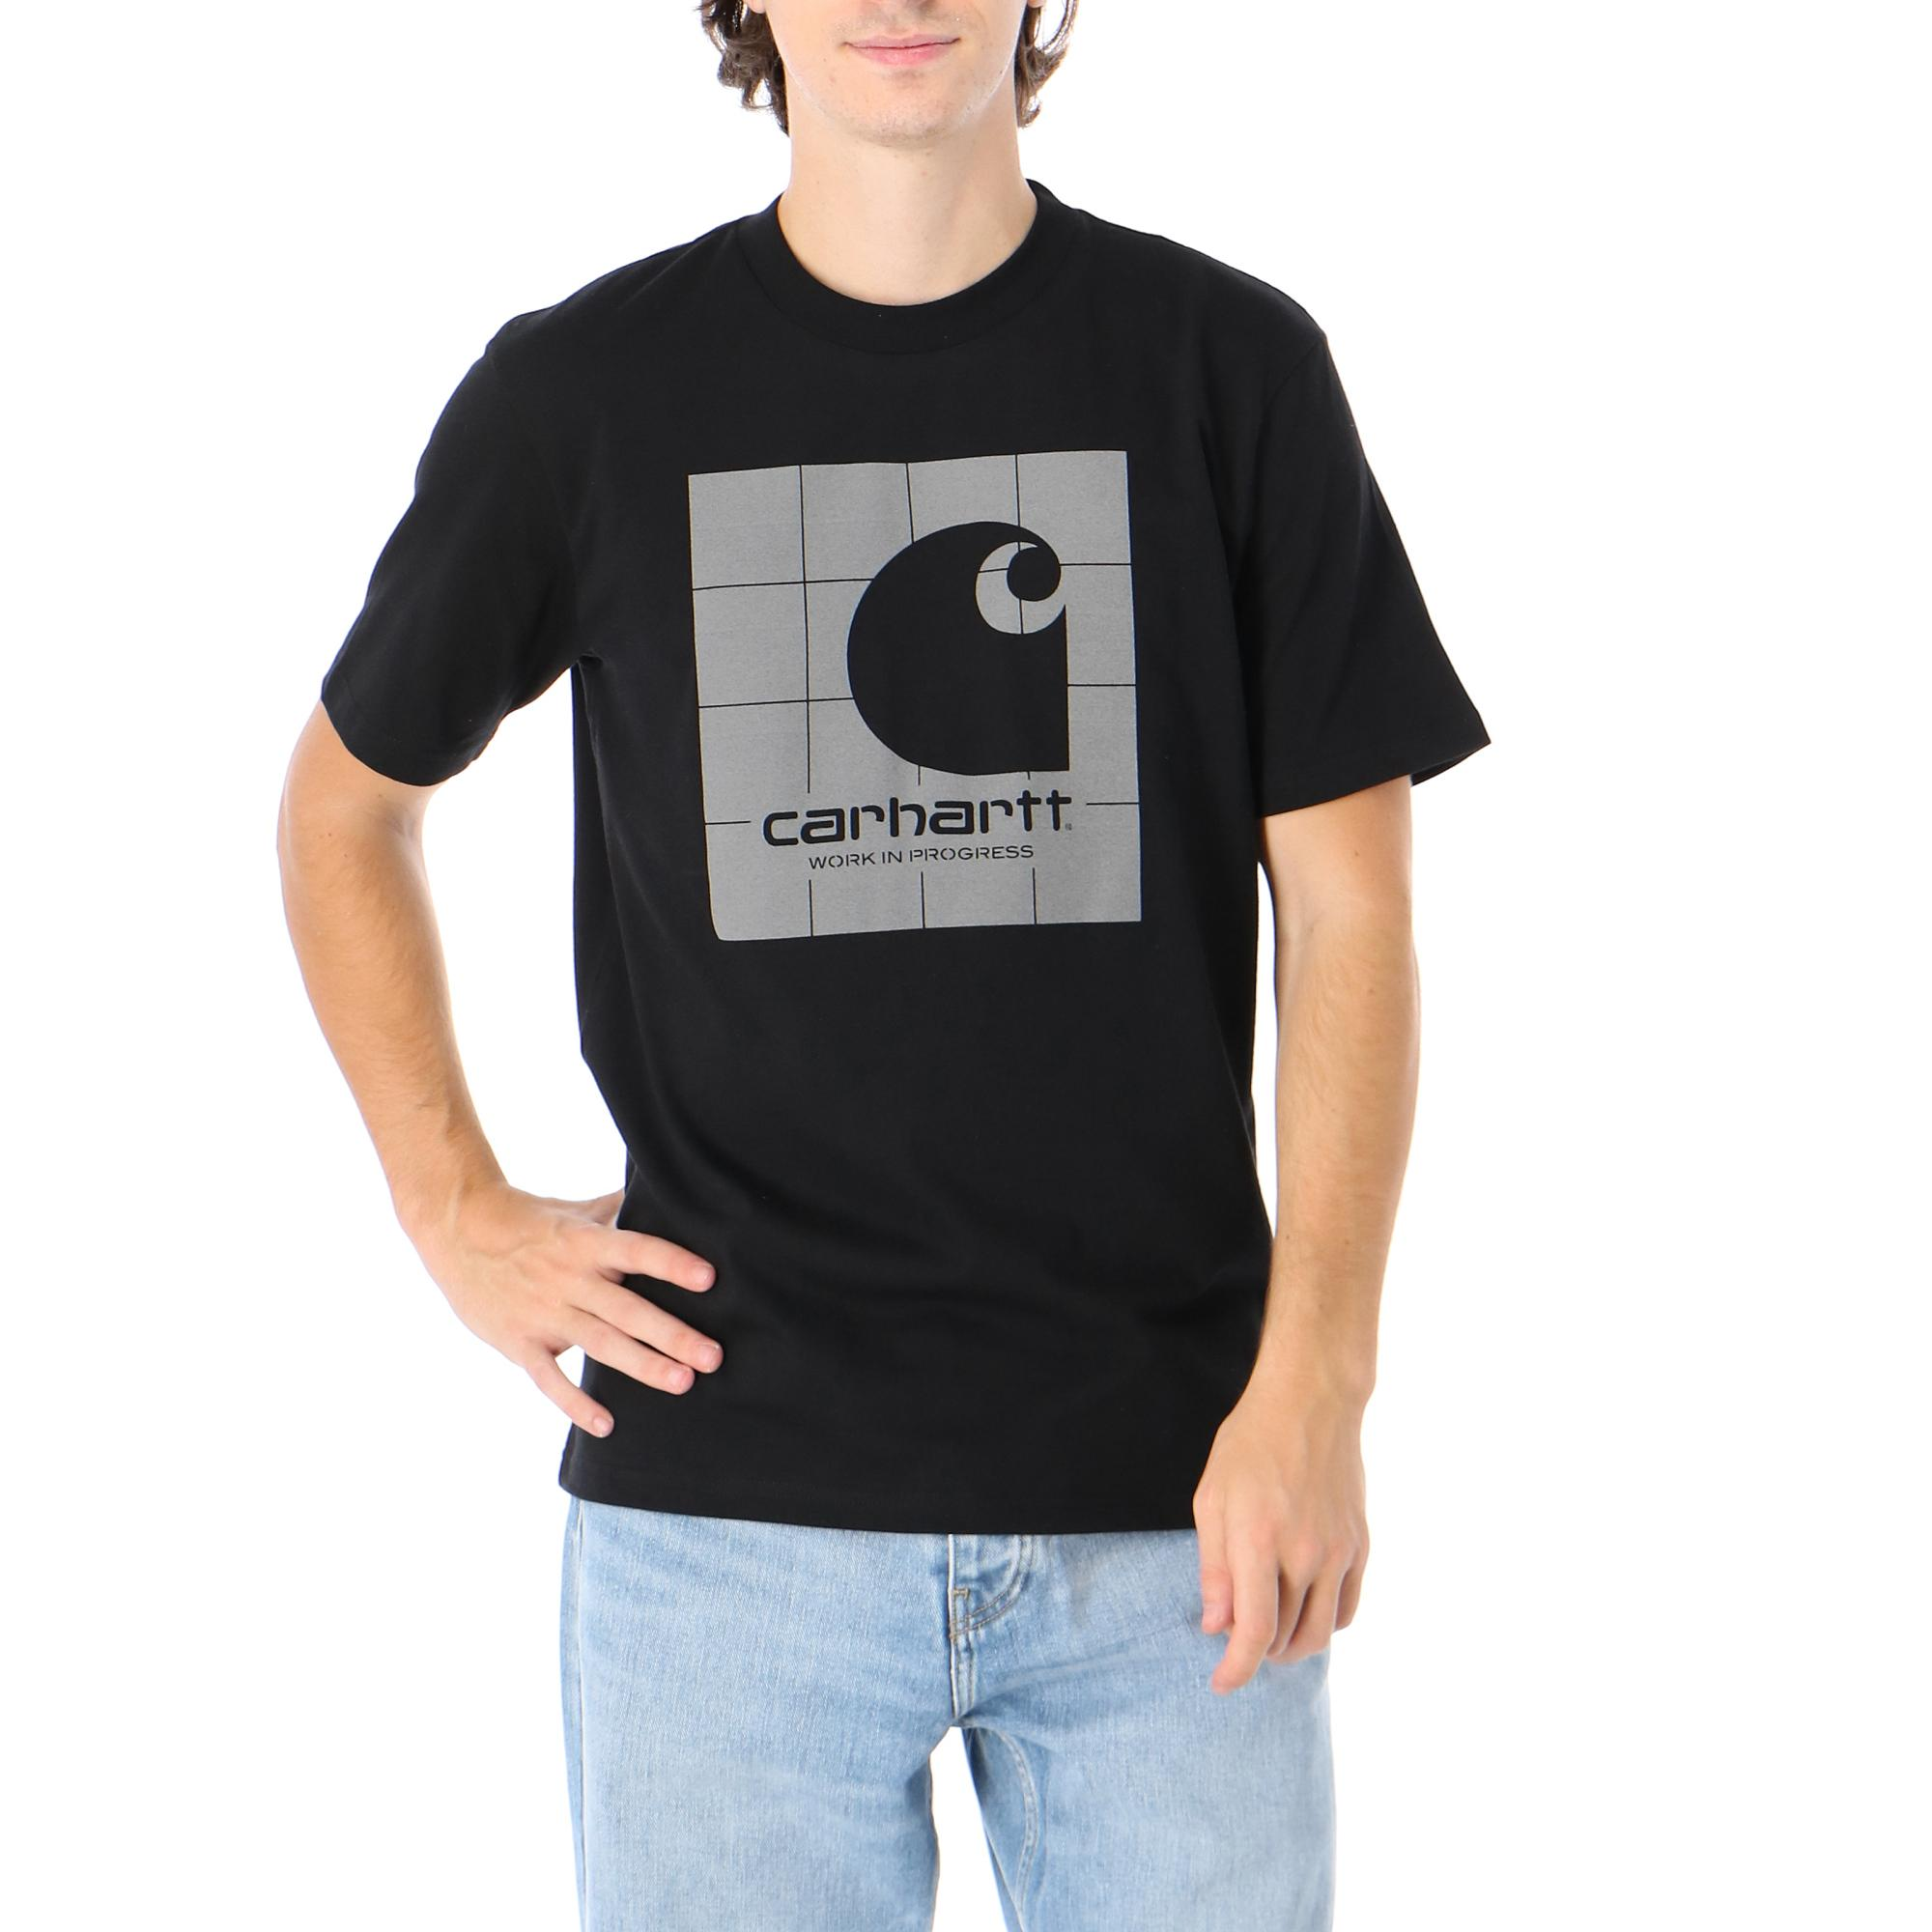 Carhartt S/s Reflective Square T-shirt Black reflective grey